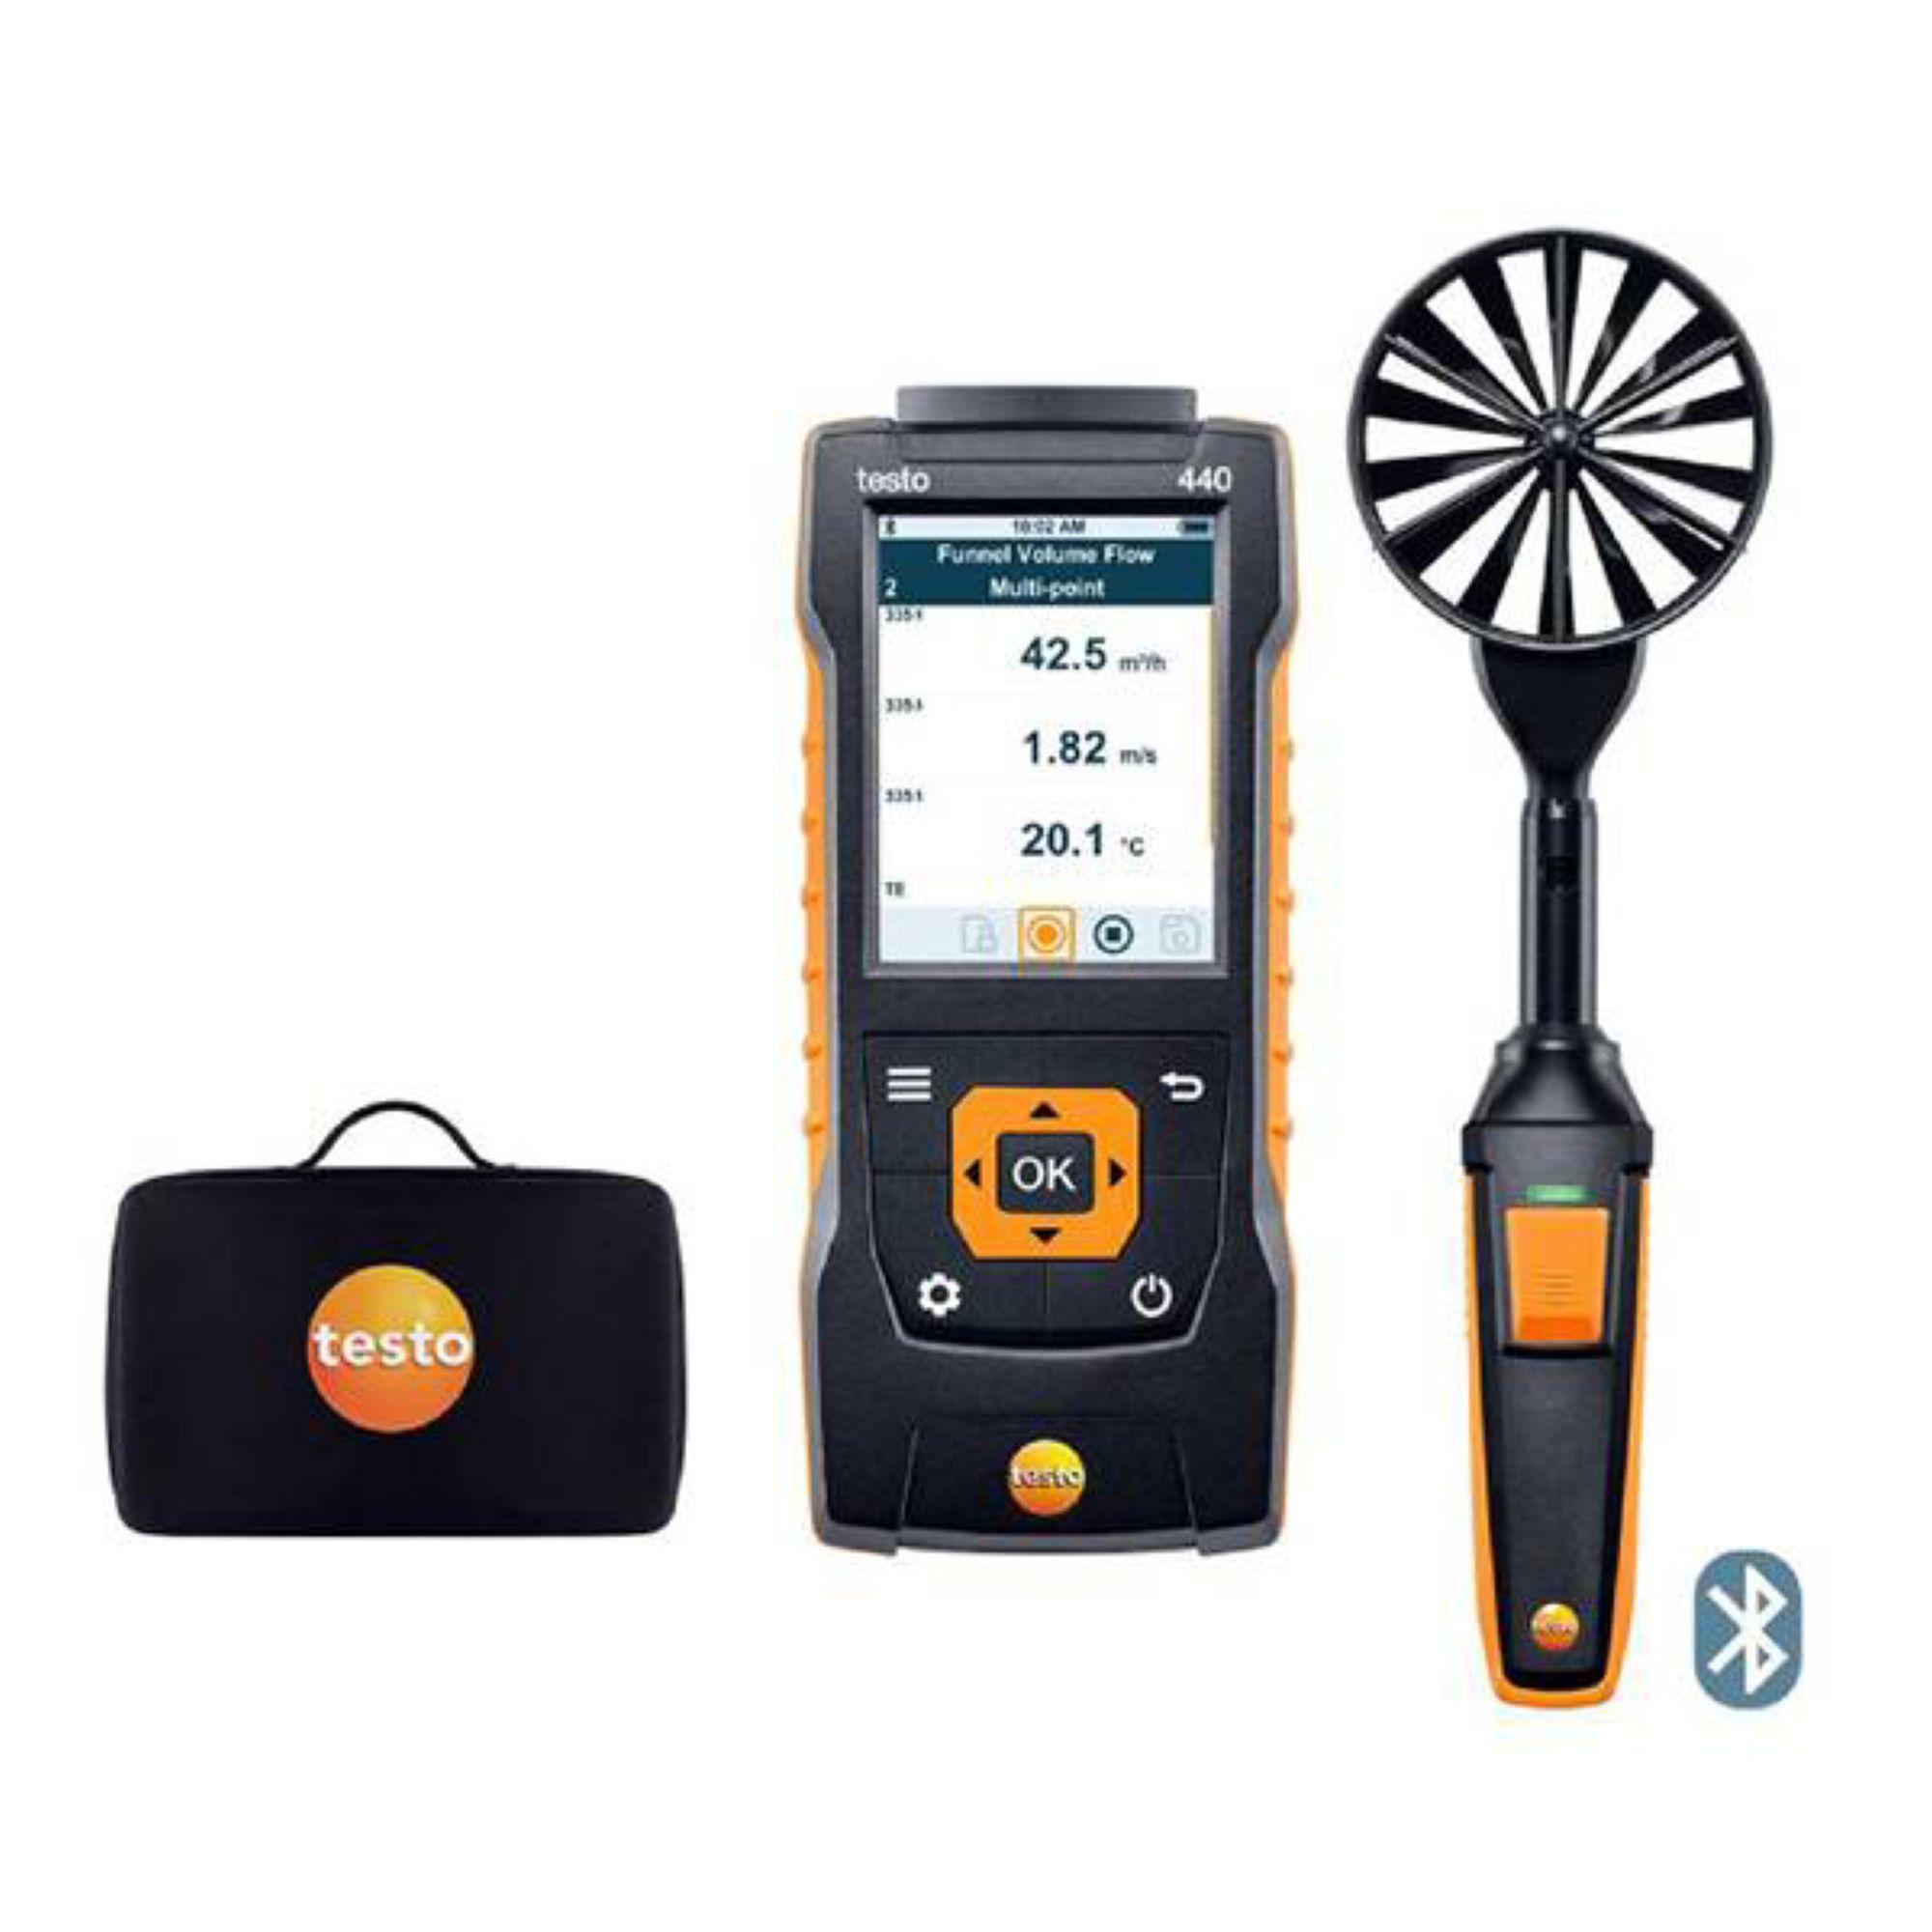 testo 440 100mm Vane Kit with Bluetooth